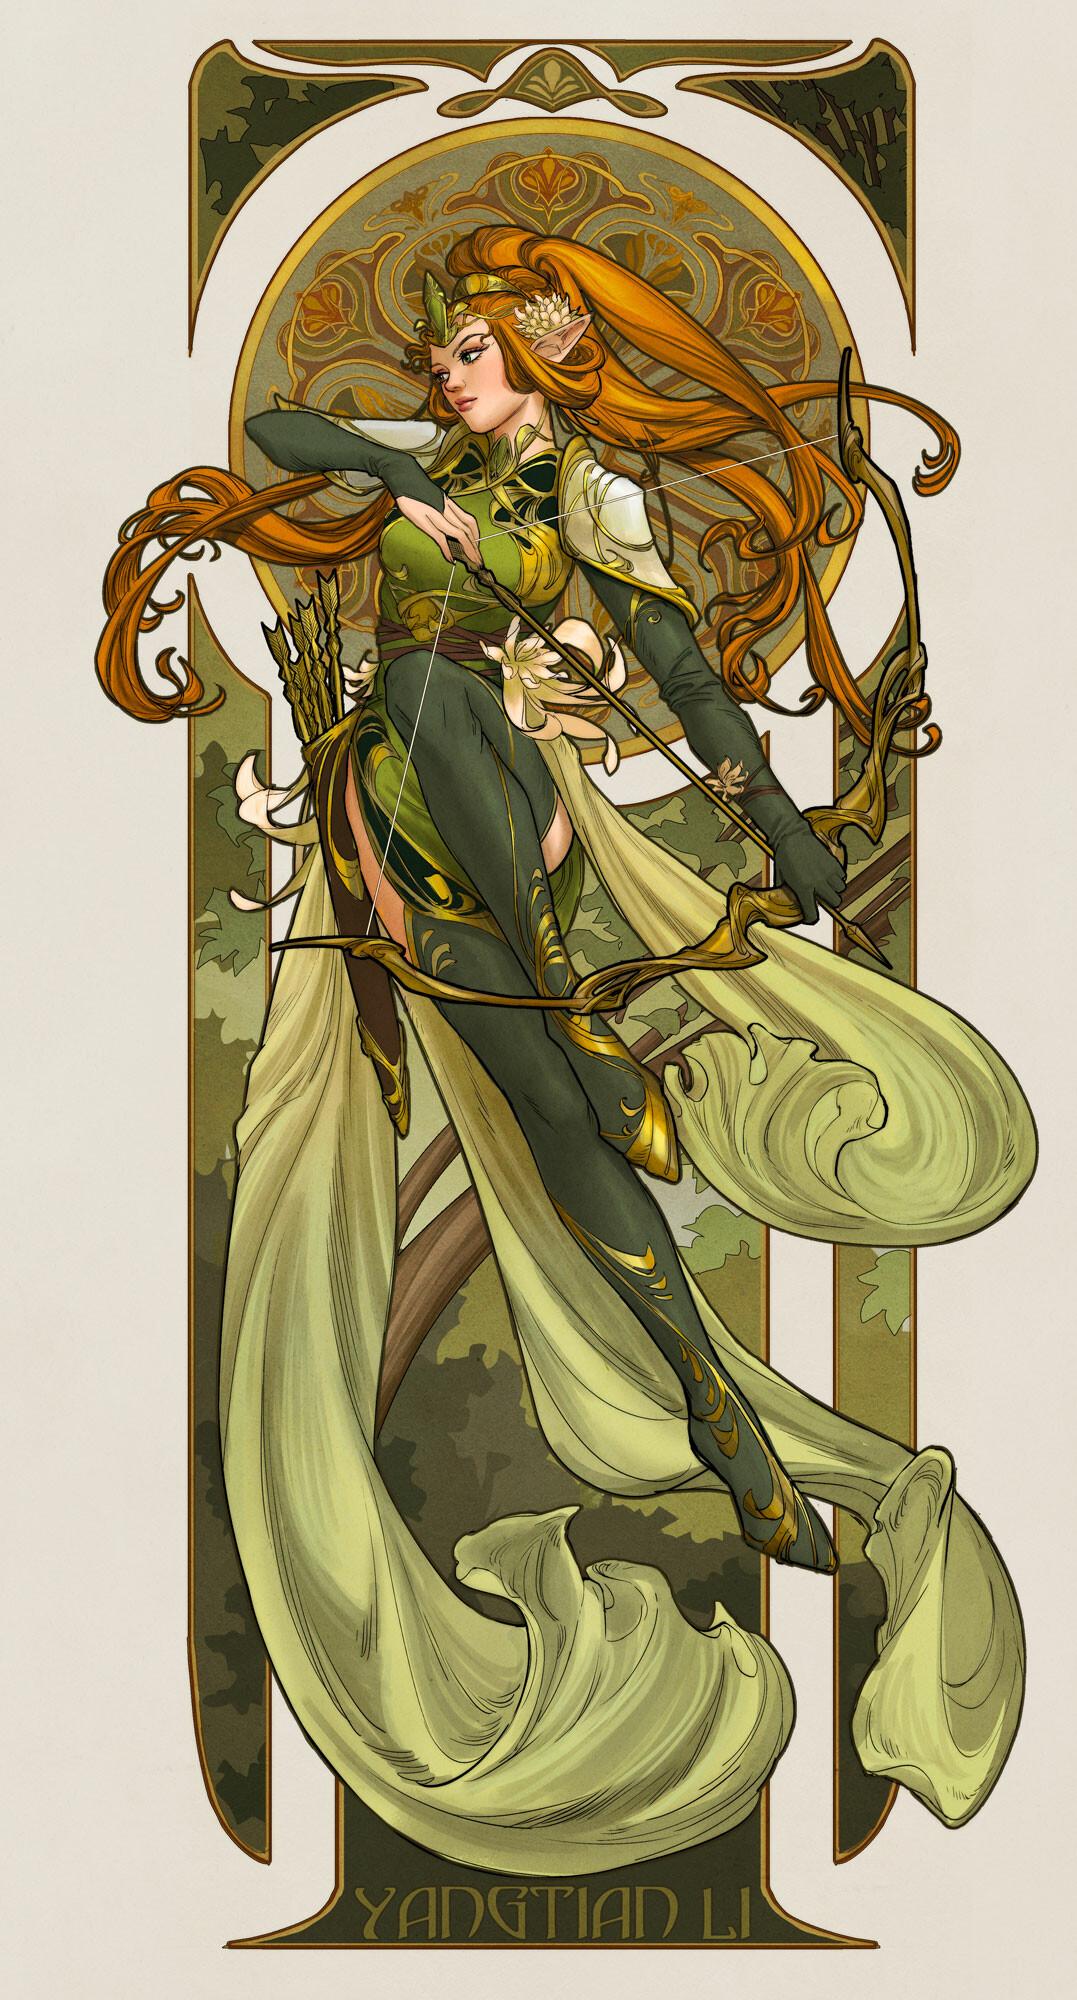 GirlsclubAsia-Artist-yangtian-li-elf-archer-4-web